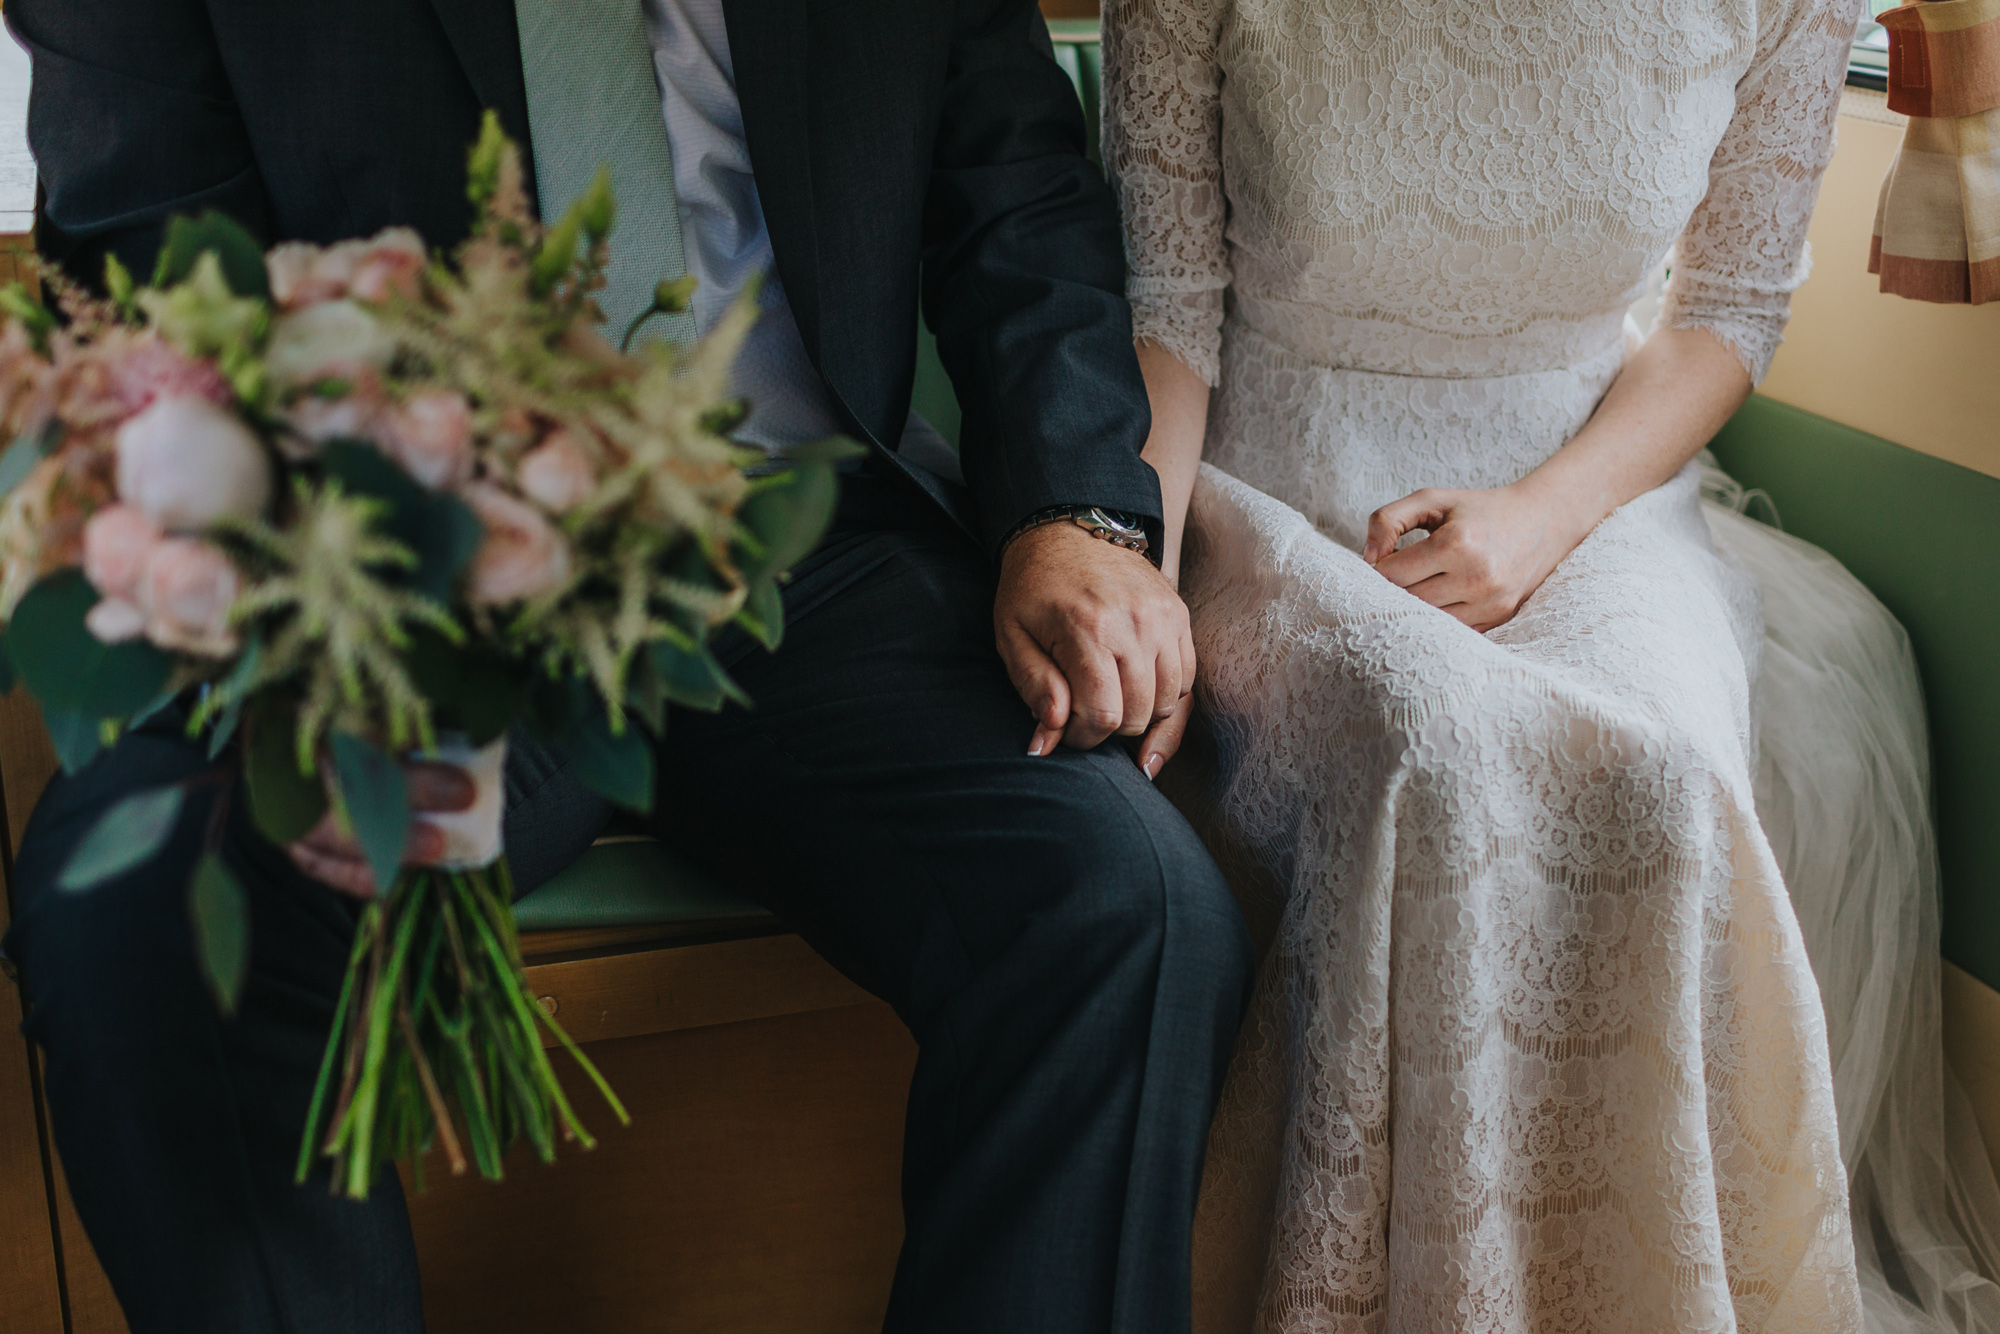 Kate-Beaumont-Lace-Flared-Dahlia-Gown-Leeds-Wedding-Bloom-Weddings-13.jpg